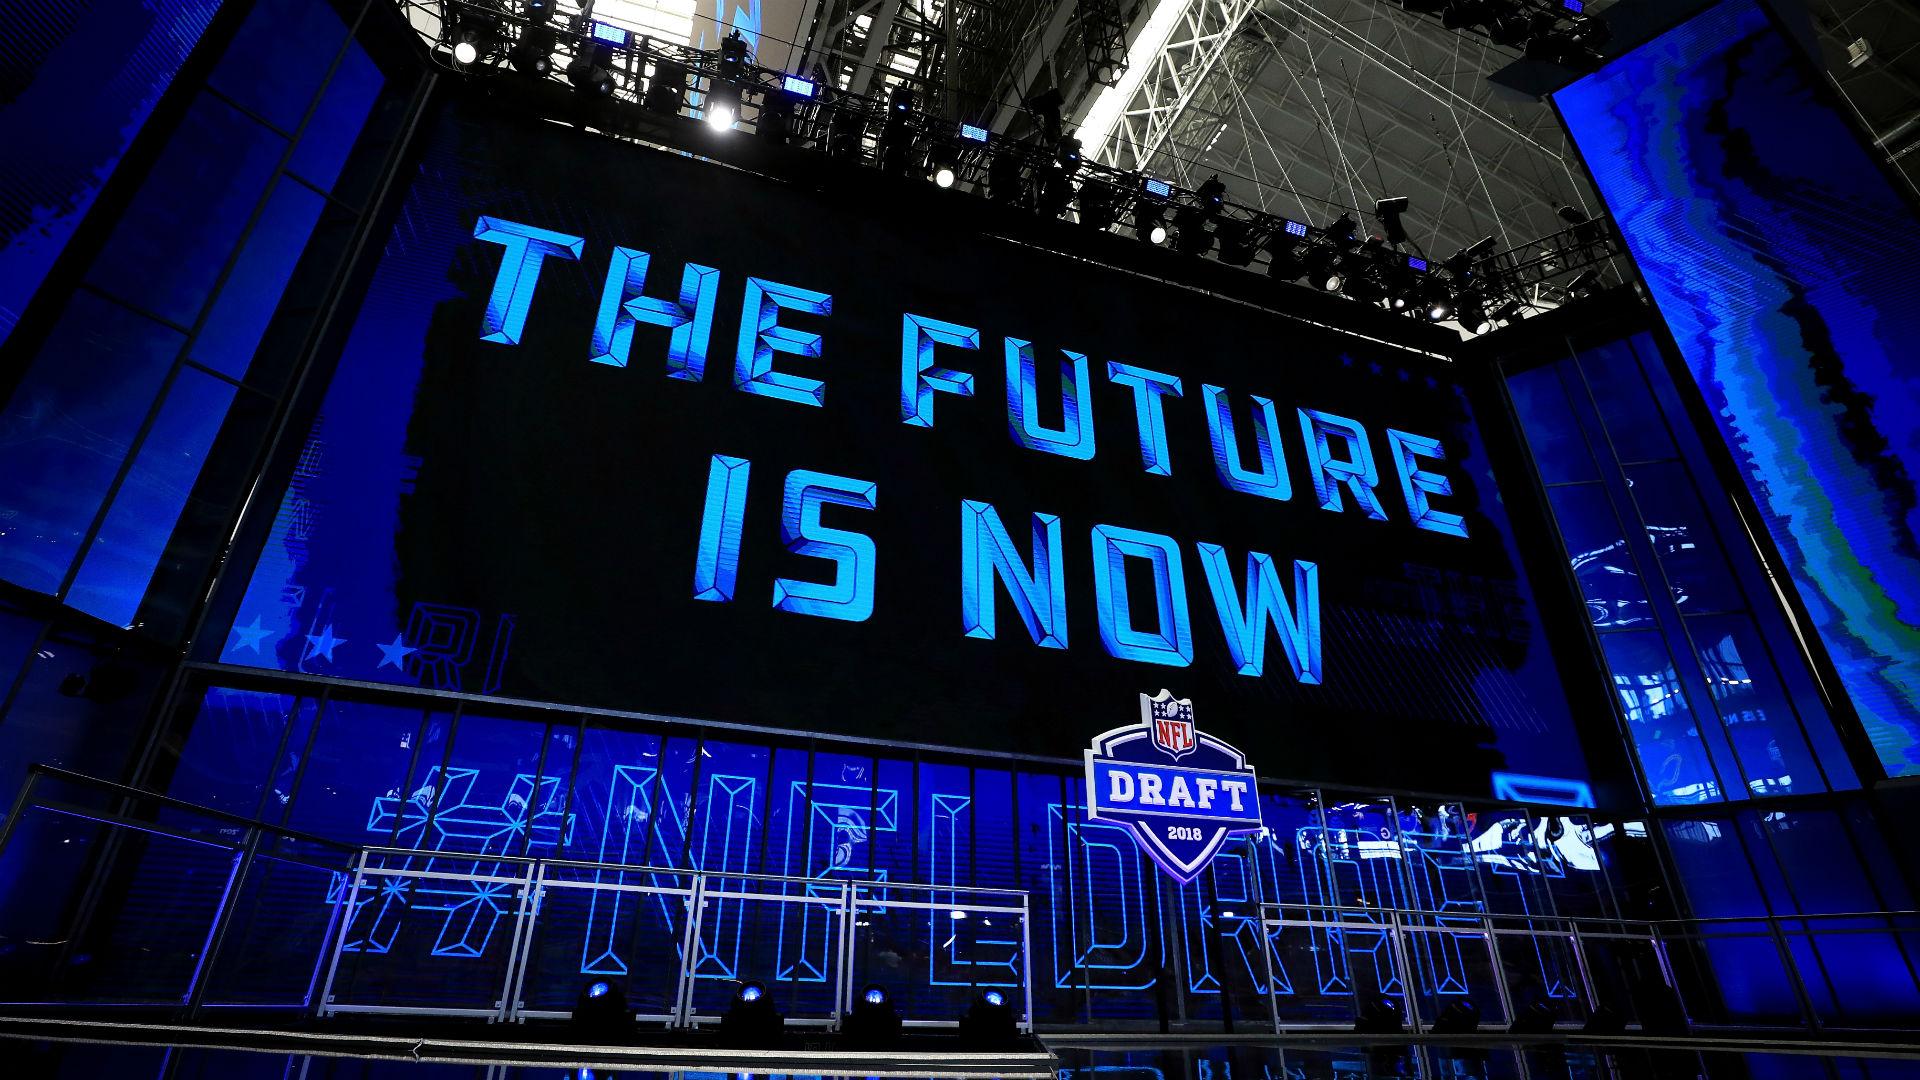 Nfl Draft 2019 Schedule NFL Draft 2019: Date, time, order of picks, TV channel, live